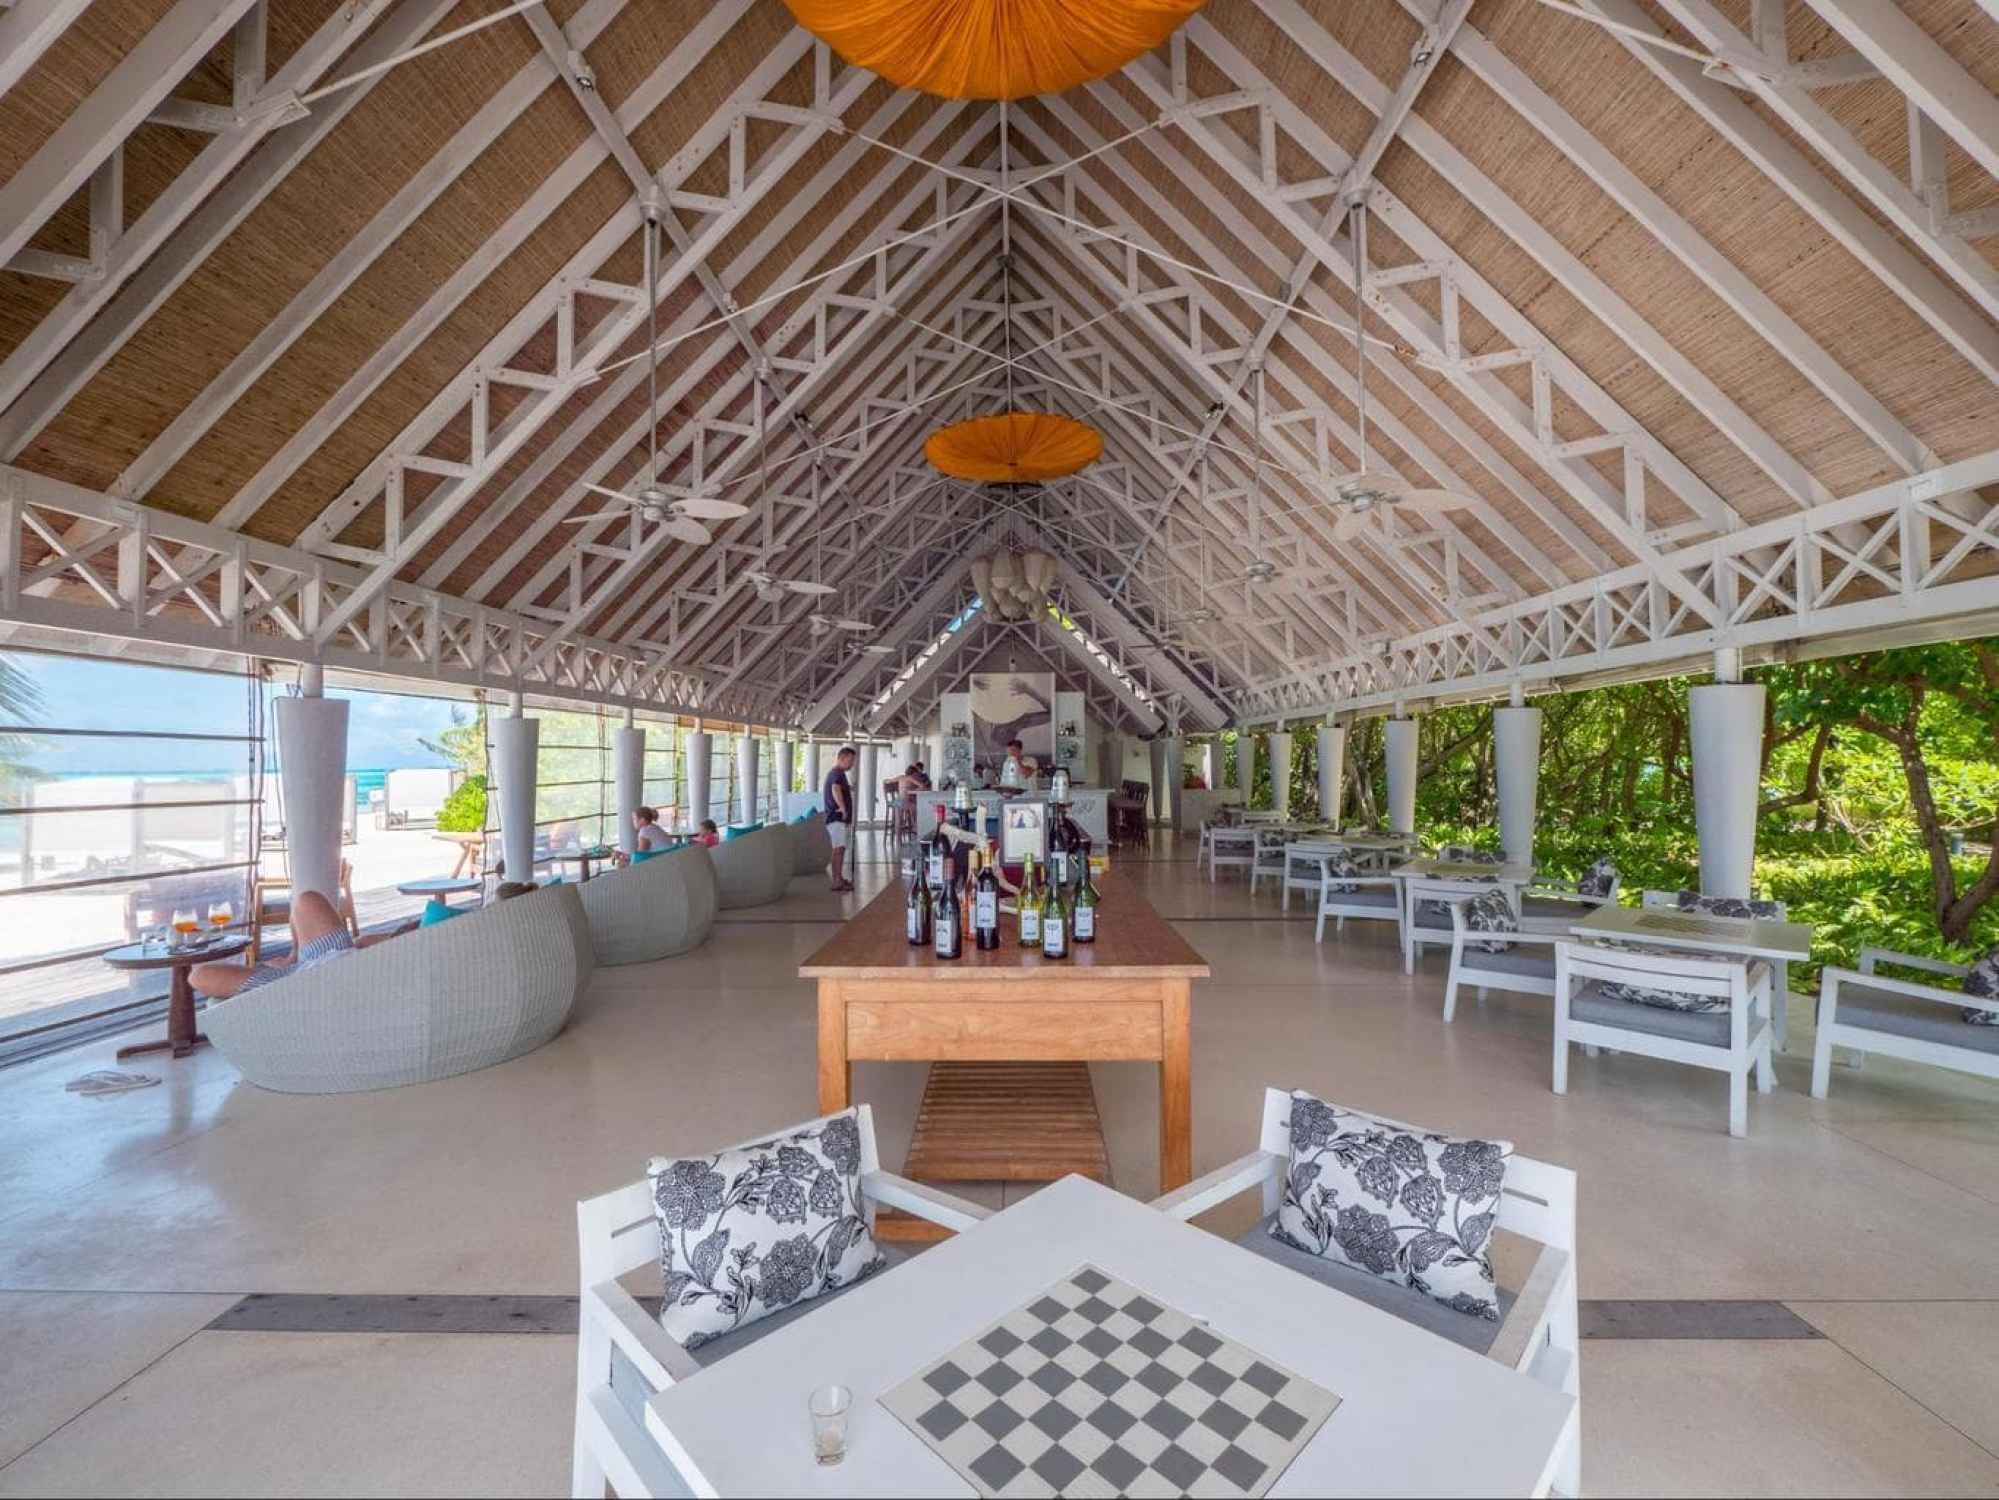 Senses Bar and lounge